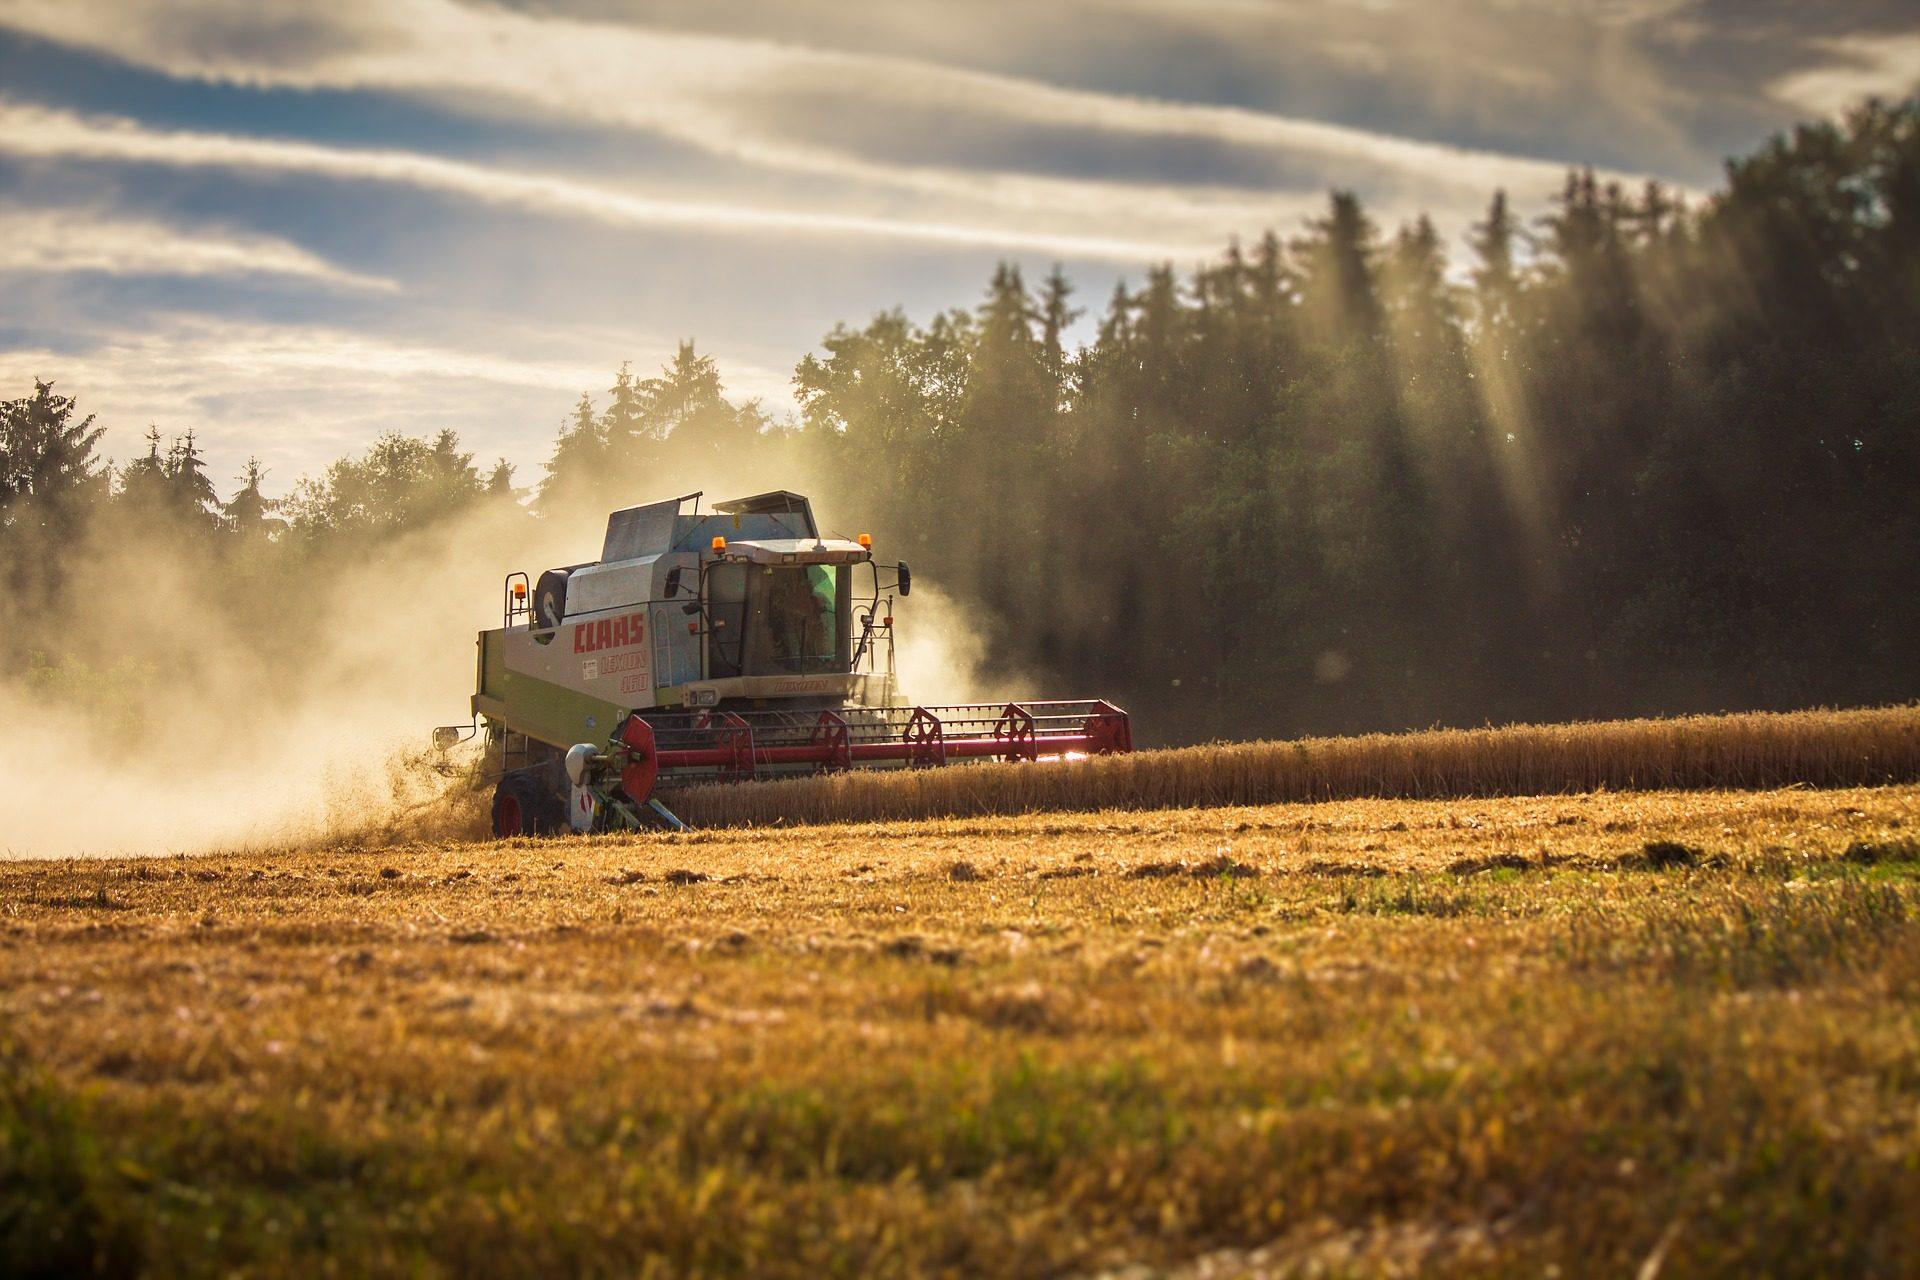 máquina, cosechadora, campo, cultivo, agricultura, cereales - Fondos de Pantalla HD - professor-falken.com